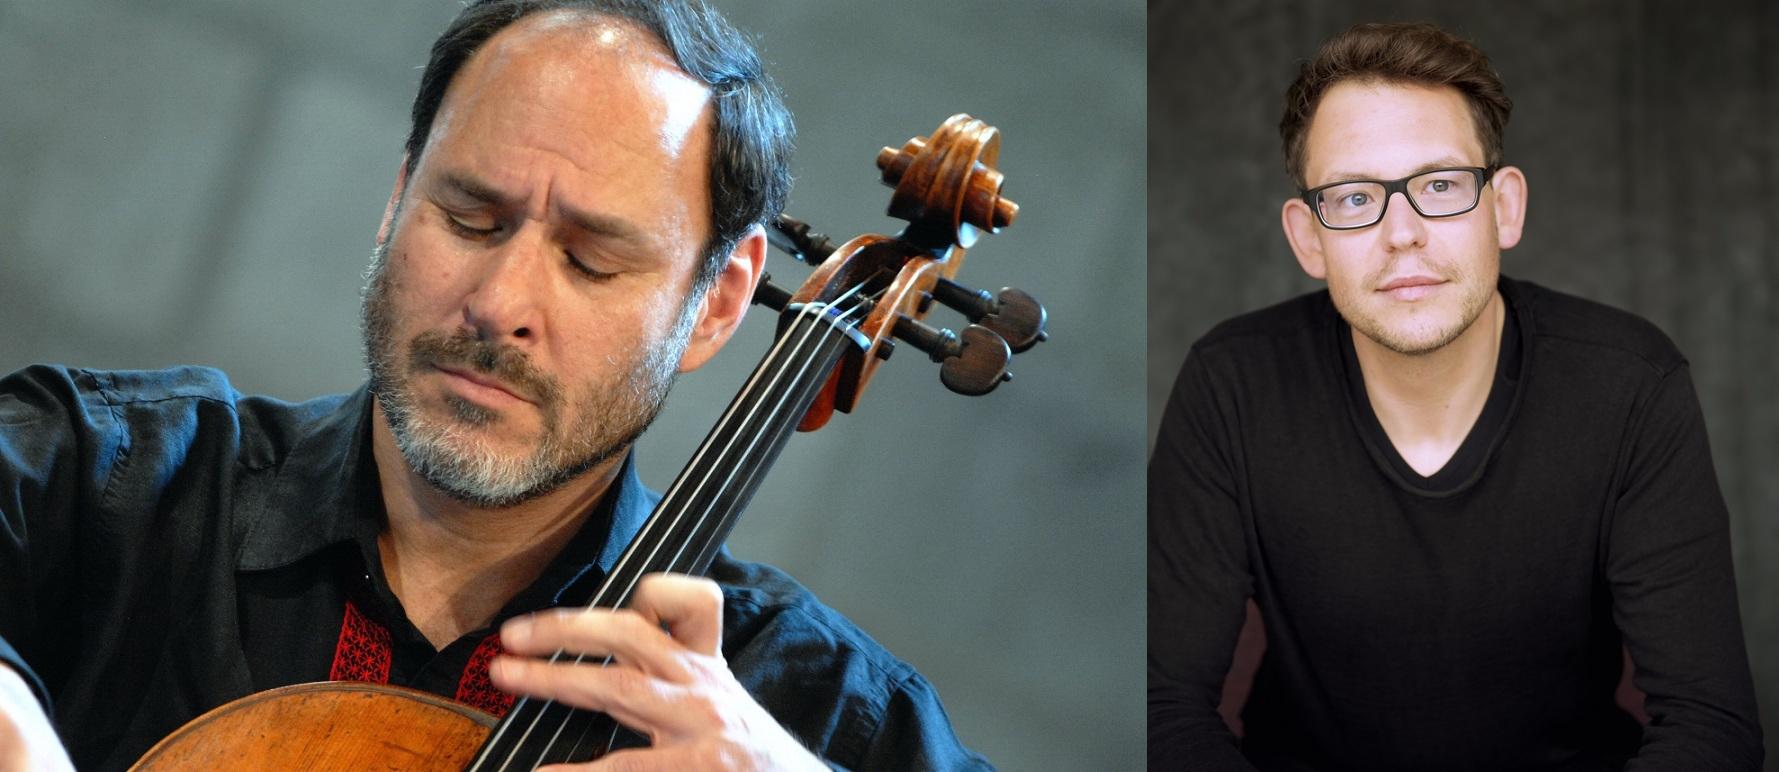 Per la Stagione dell'OPV, Daniel Huppert dirige il violoncellista Gary Hoffman in pagine di Schumann, Čajkovskij, Ligeti e Mozart